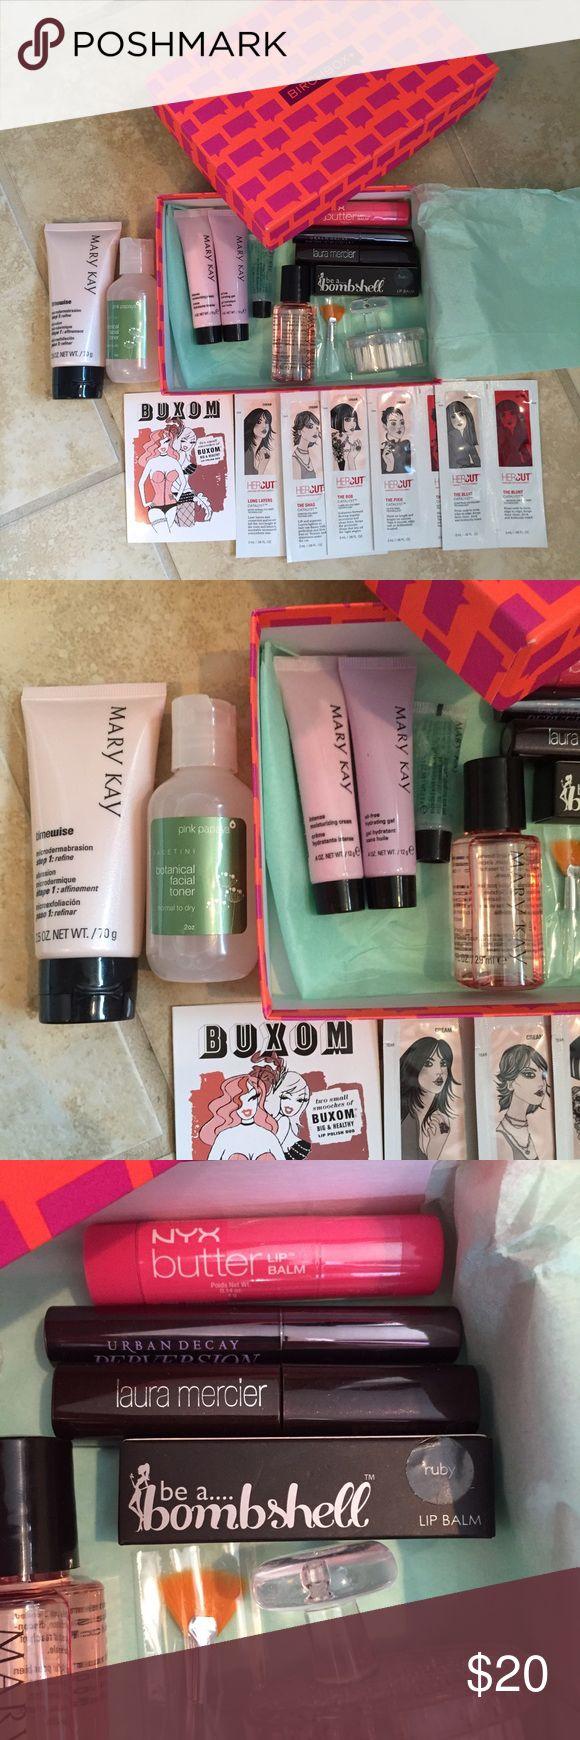 Birch box full of goodies Moisturizer cream, Eye makeup